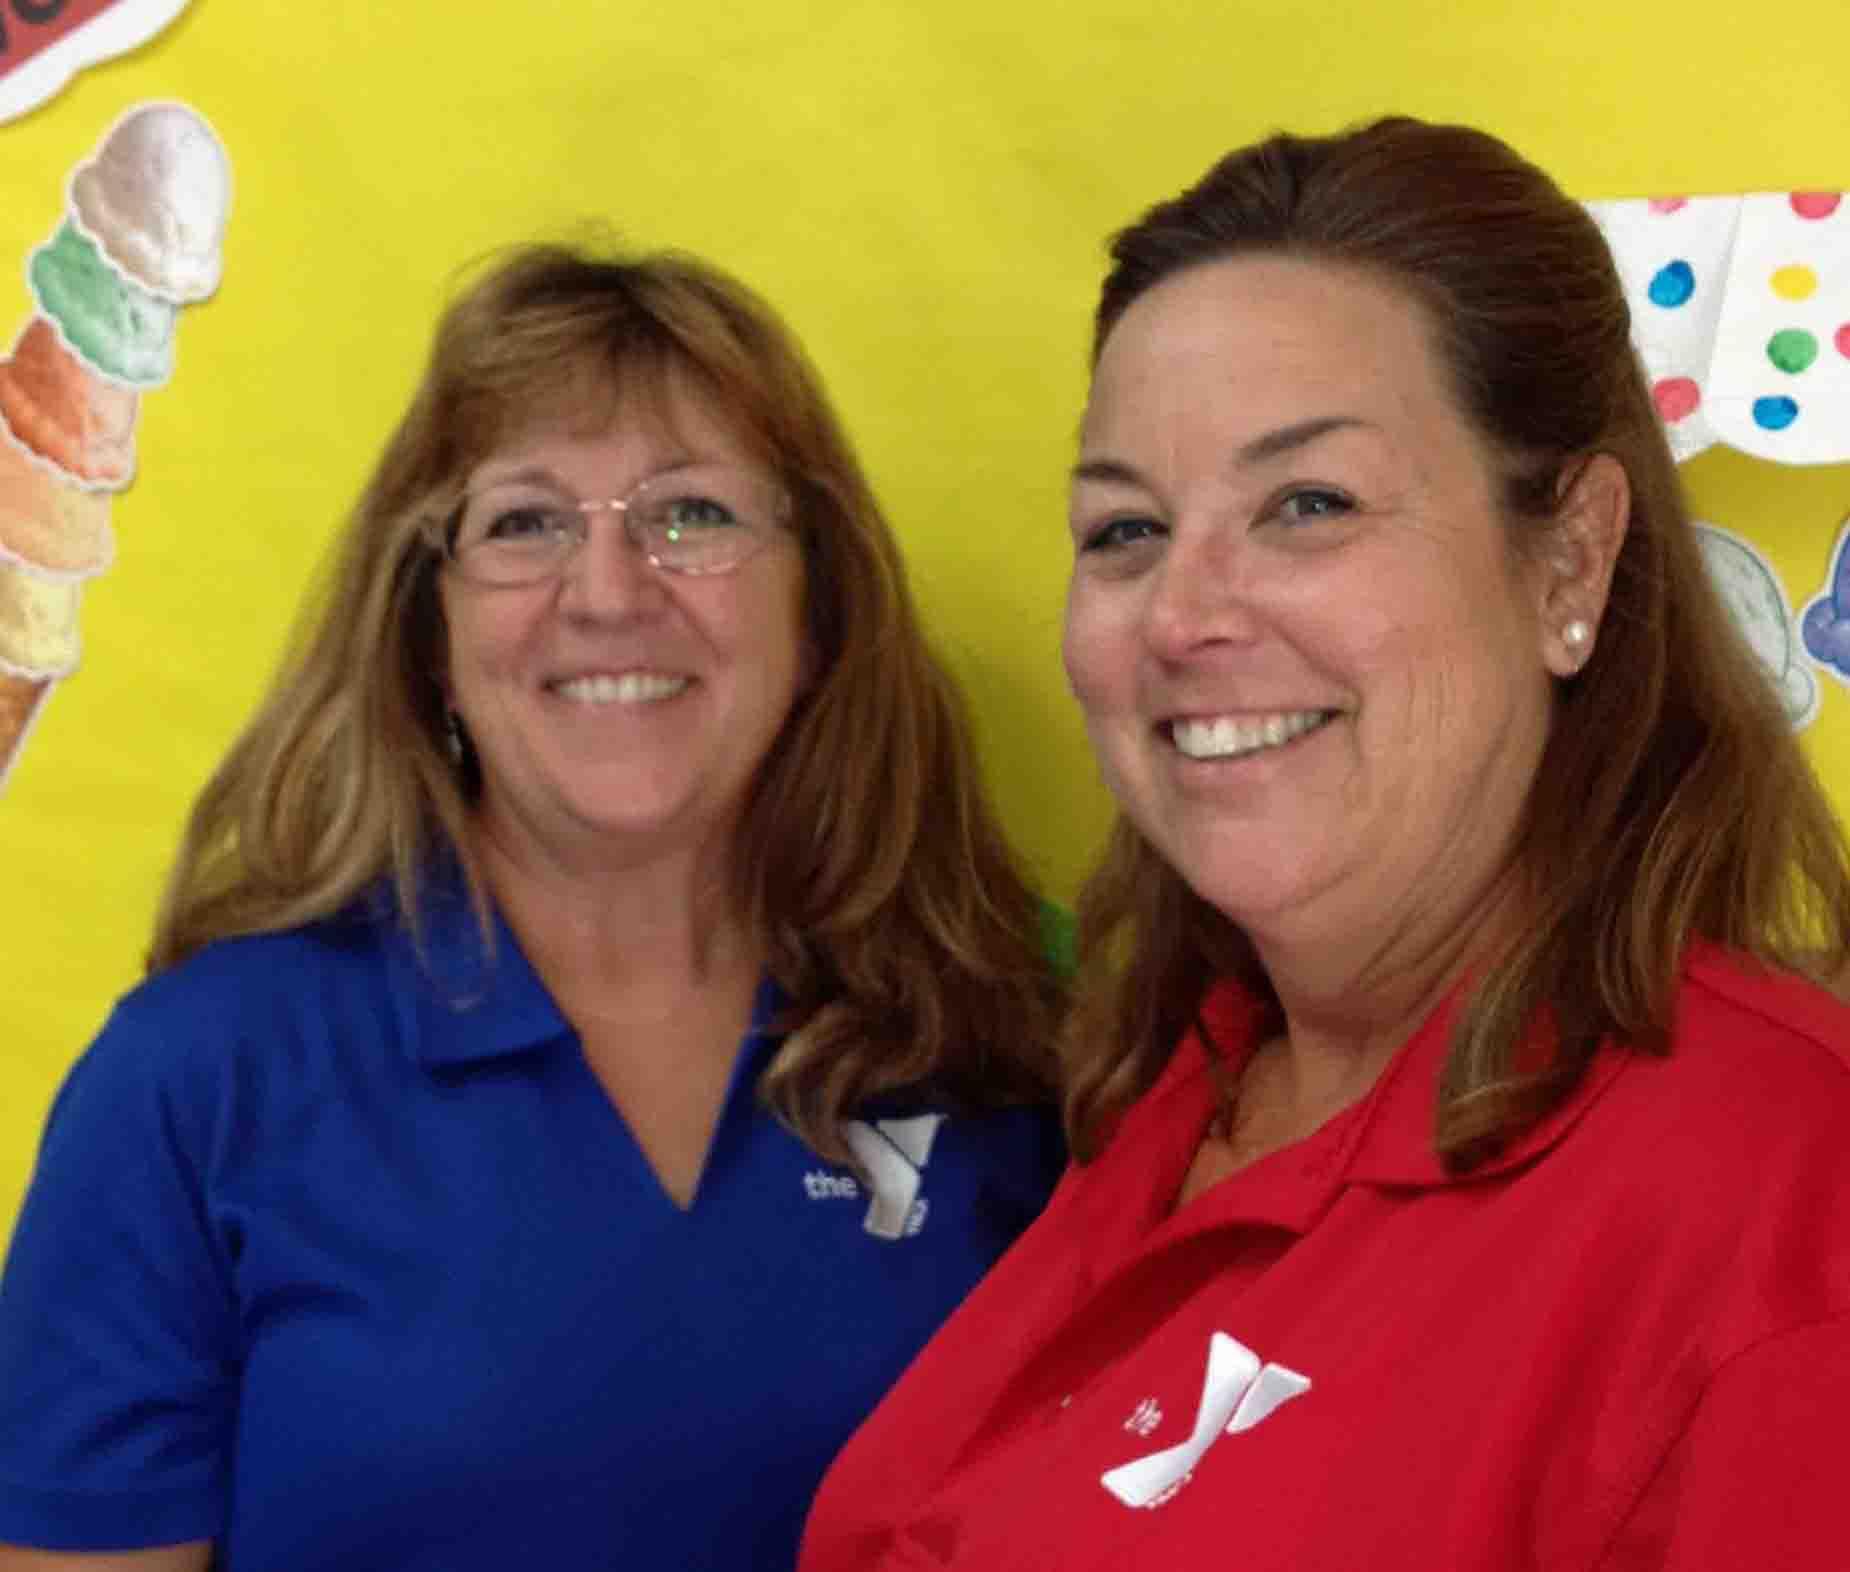 Ellen Turk (left) and Christi Galan are preschool teachers at the Miller YMCA.